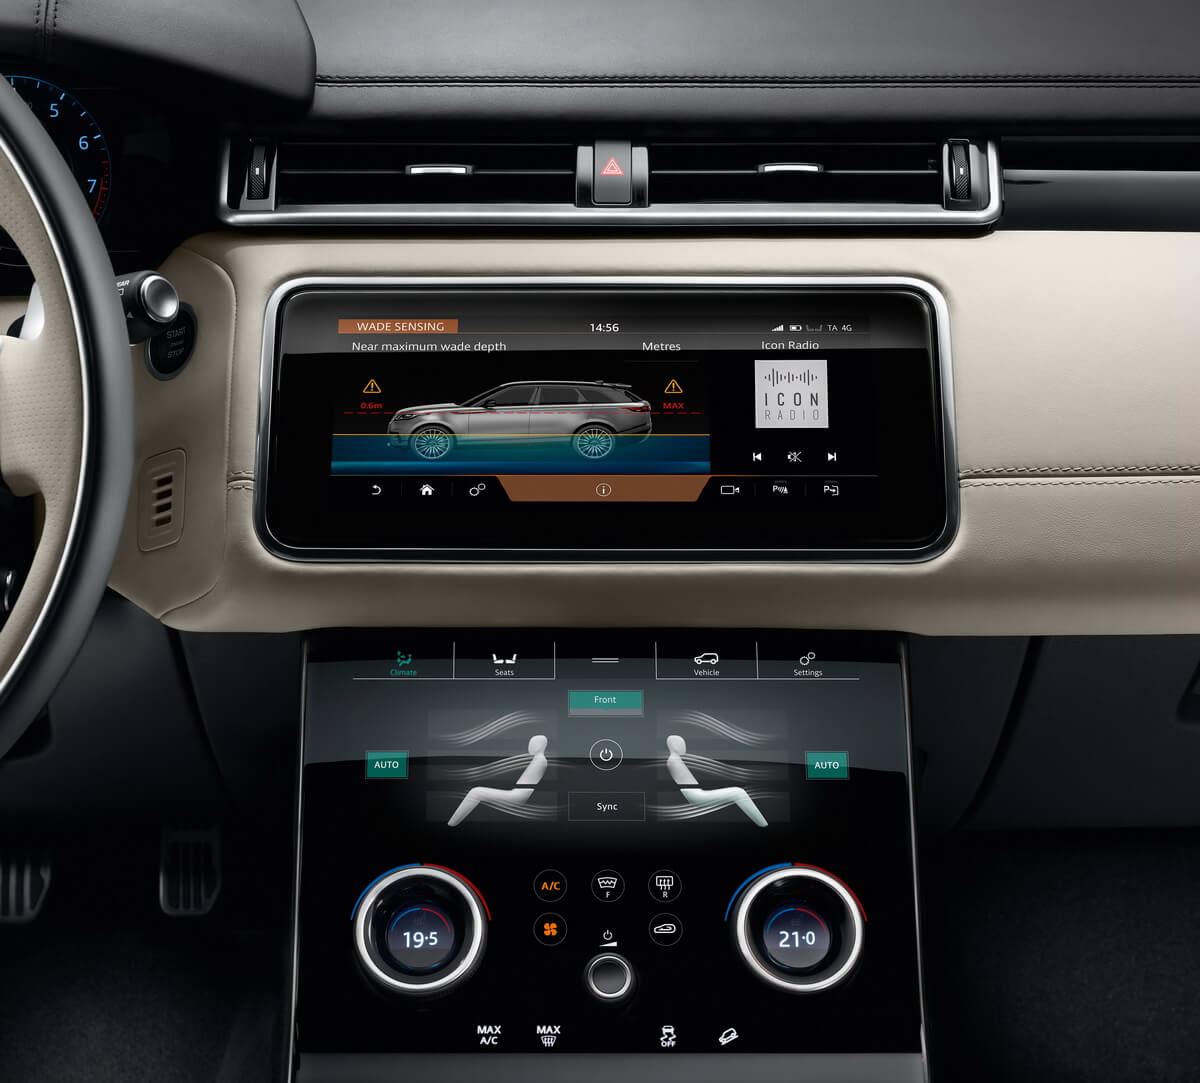 Range Rover Velar Touch Pro Duo